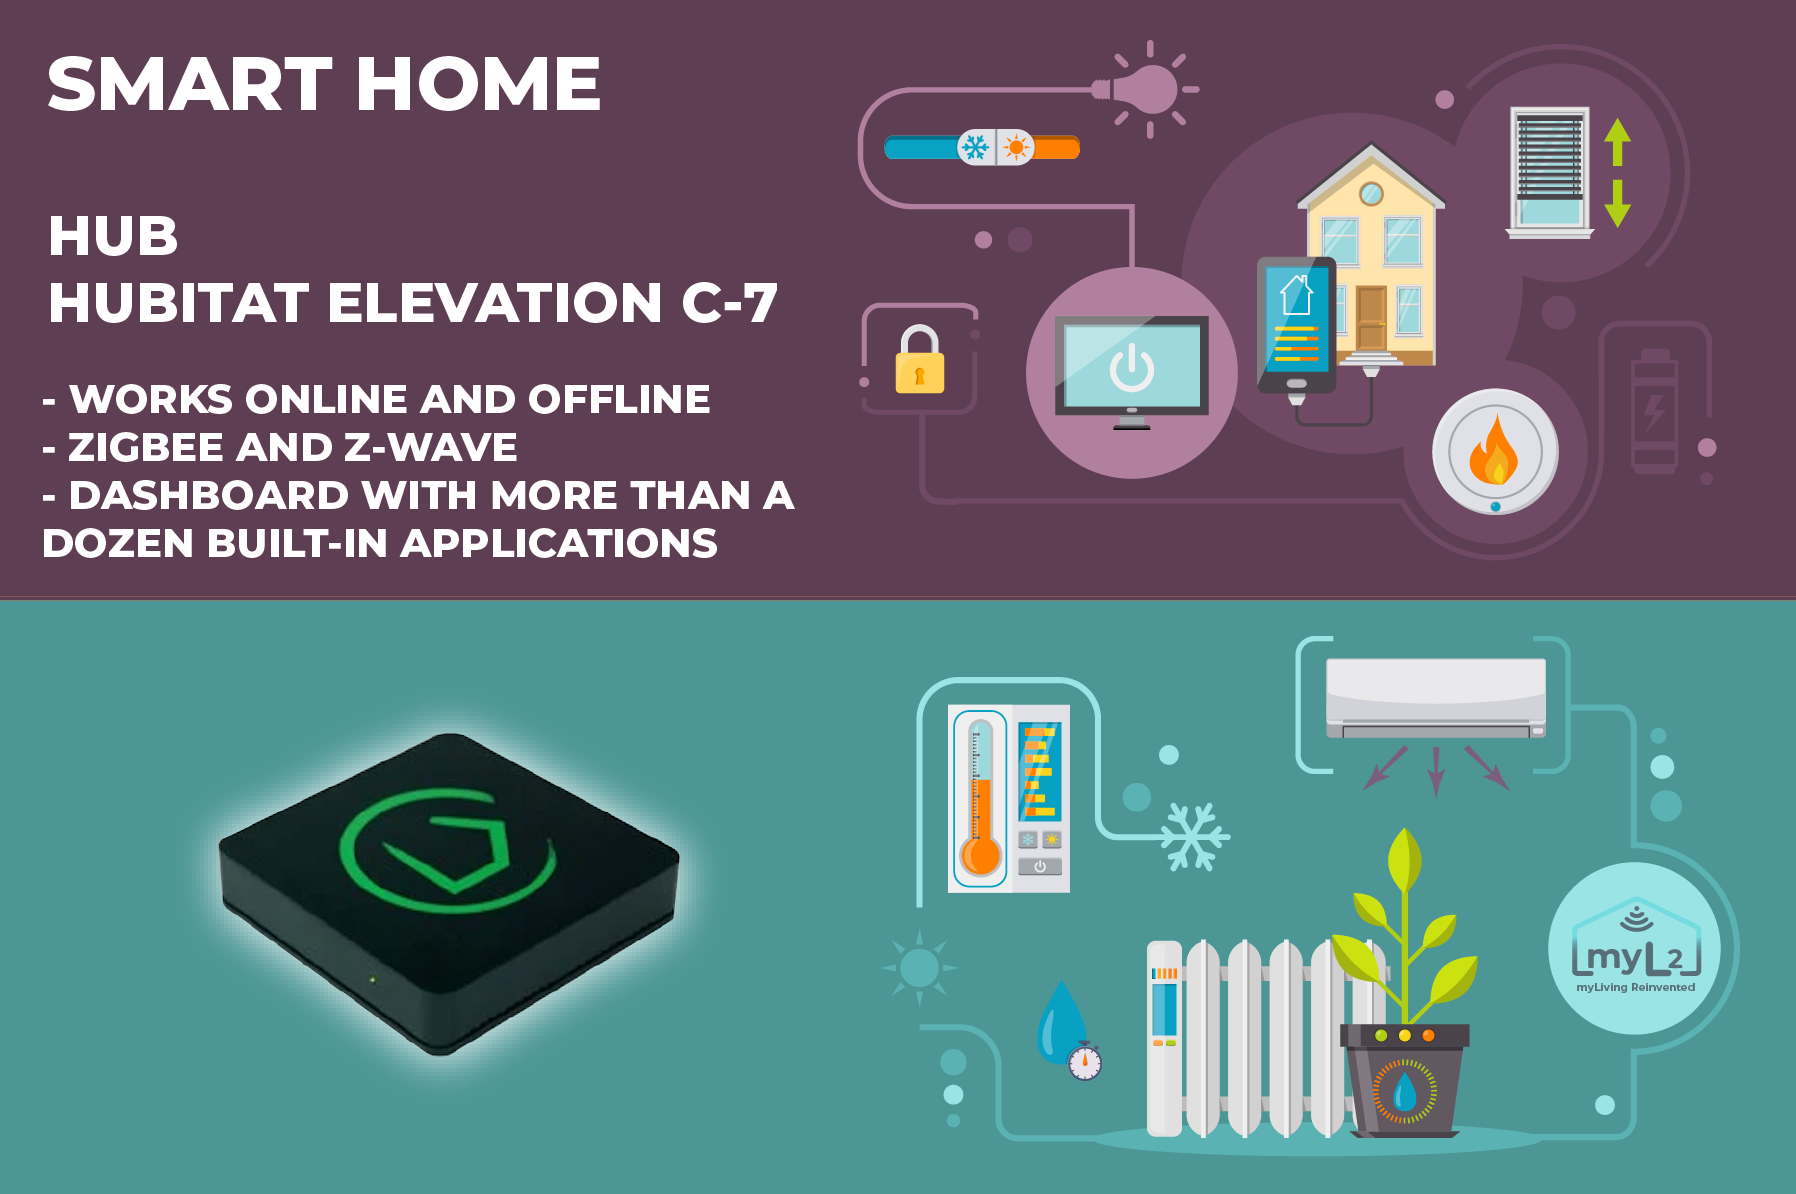 Hubitat Elevation C-7 Zigbee Z-Wave smart hub